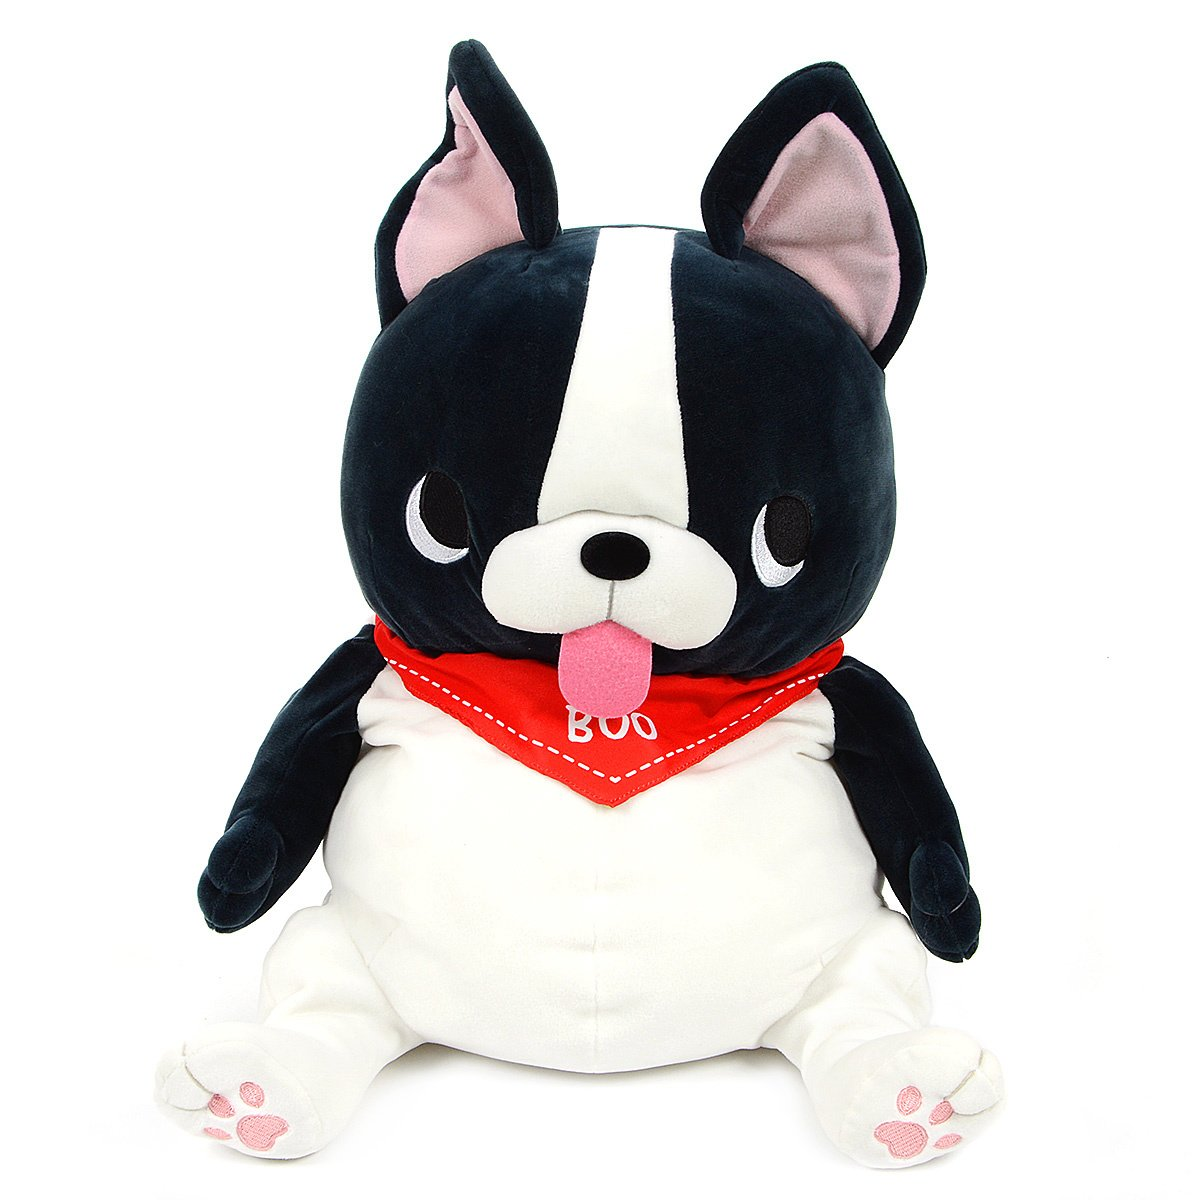 Amuse Plush Doll Pug Buruburu Boo! Boo Black / White, 17 Inches Big Size